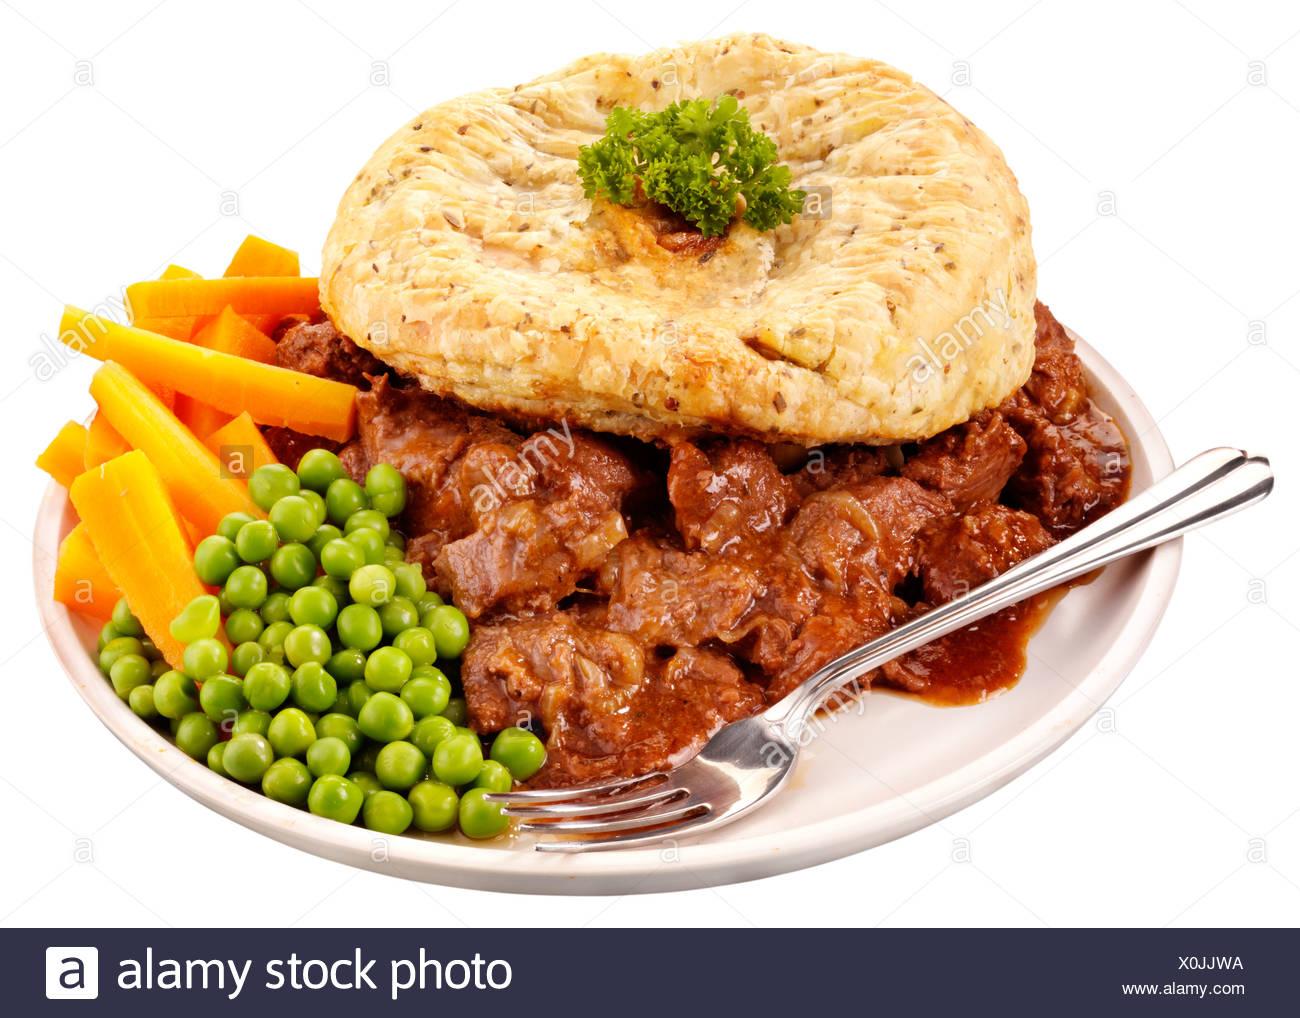 Steak Pie Dinner Stock Photos & Steak Pie Dinner Stock ...